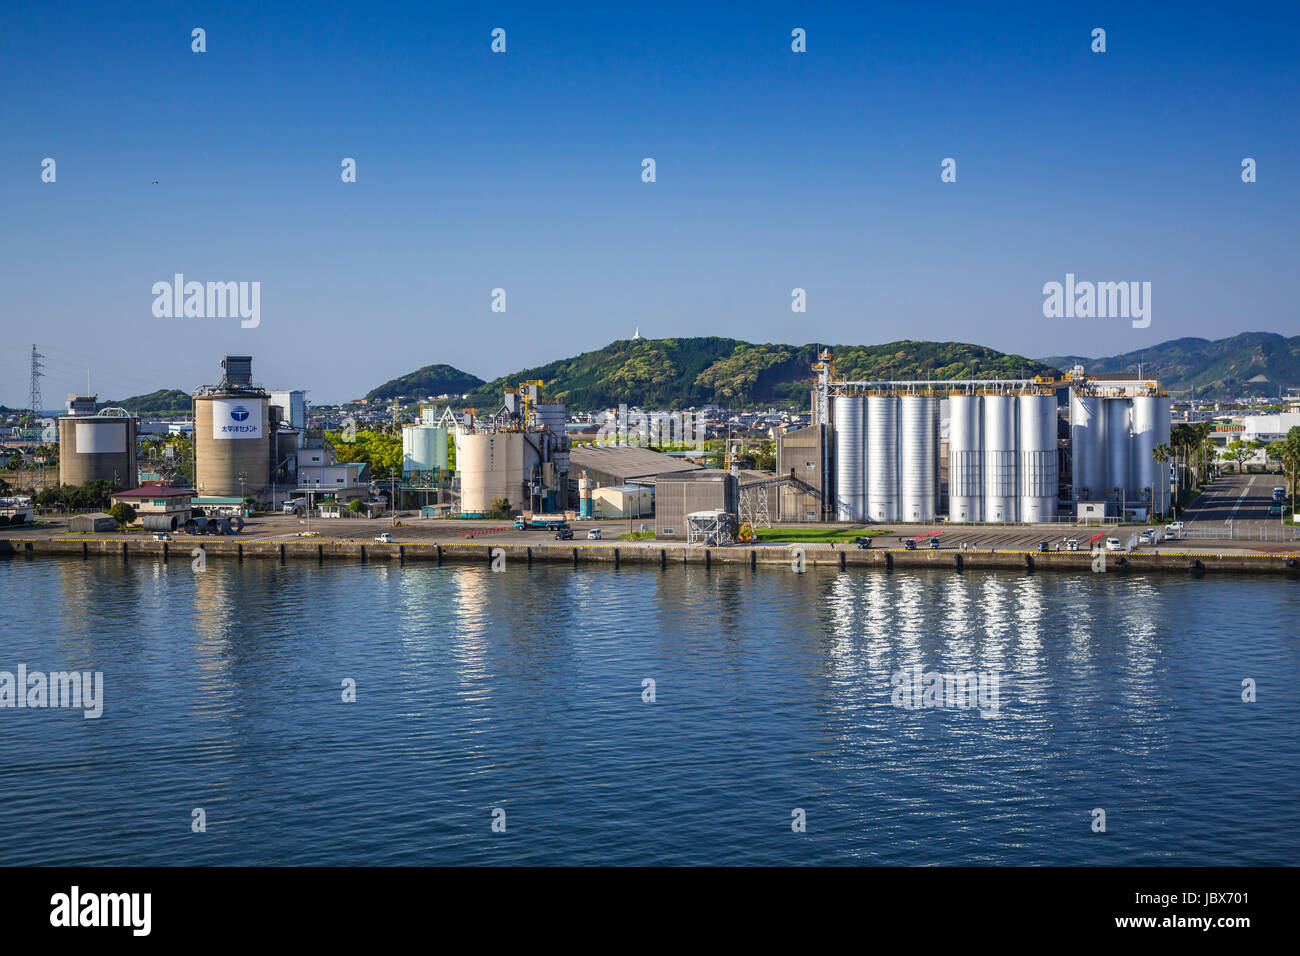 The Hososhima, Myazaki port, on the eastern coast of the Miyazaki Prefecture of Kyushu, Japan. - Stock Image